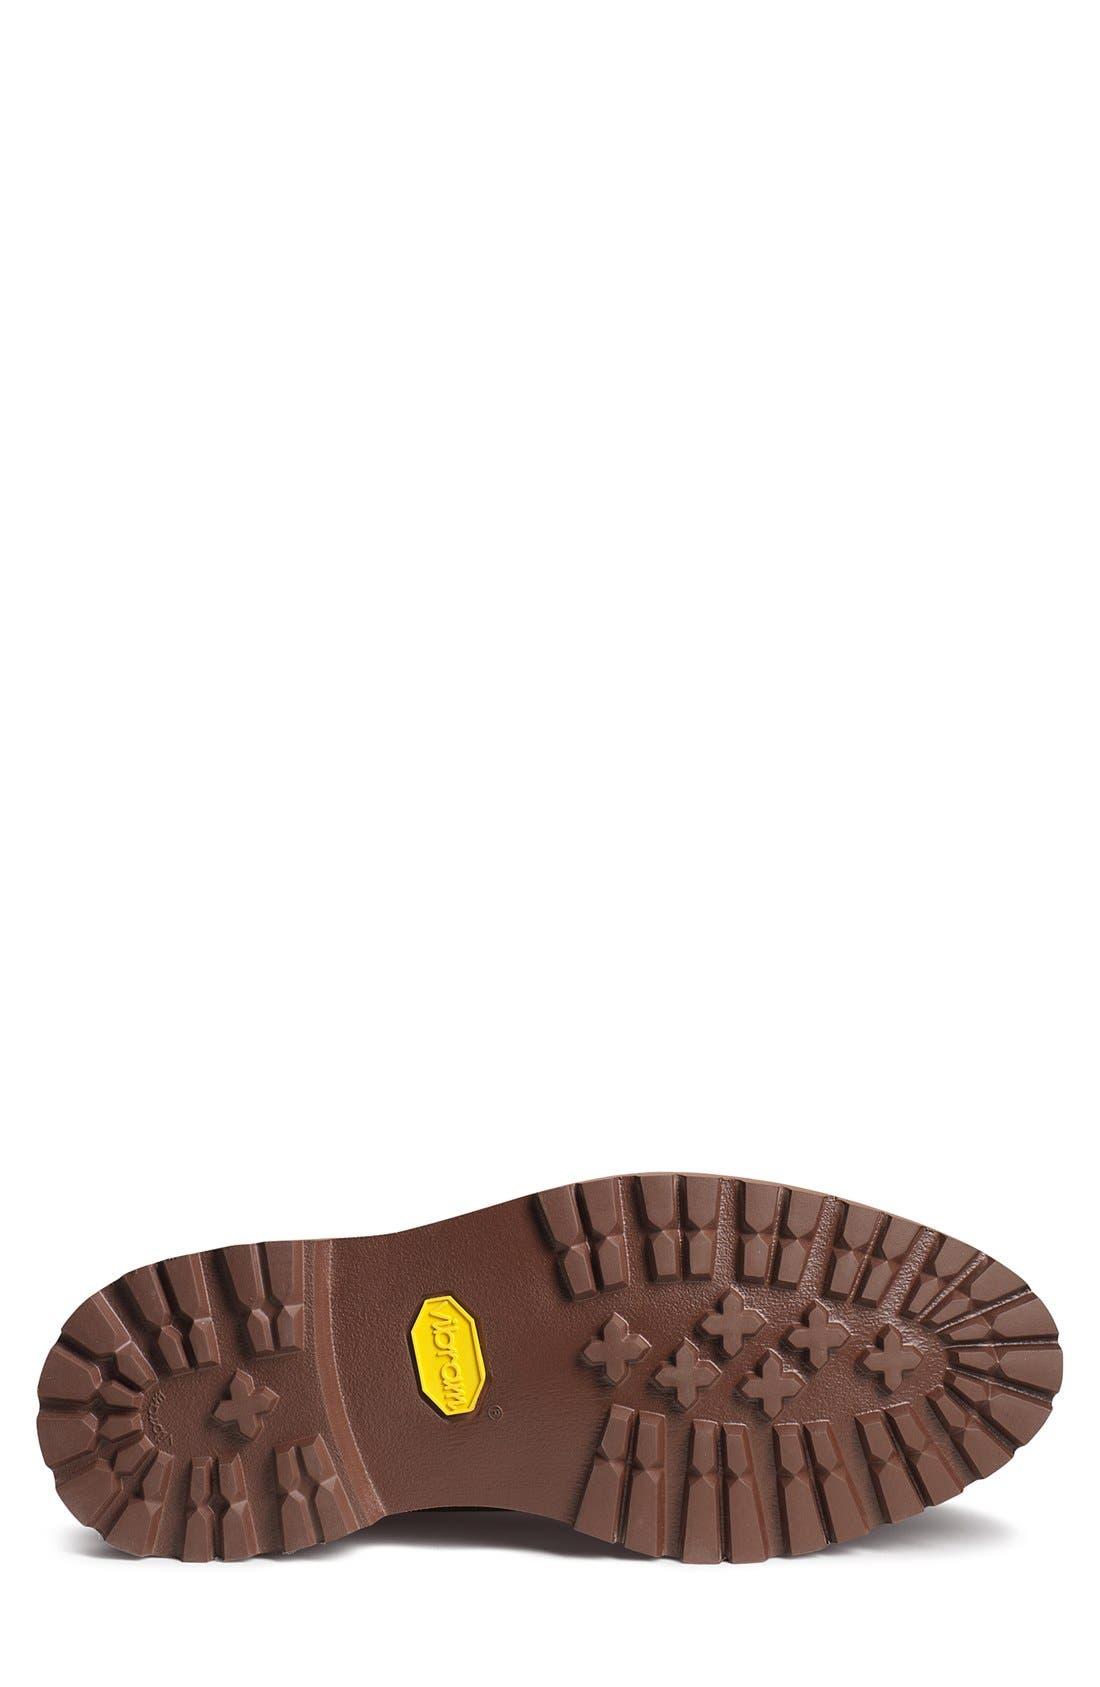 'Bighorn' Plain Toe Boot,                             Alternate thumbnail 9, color,